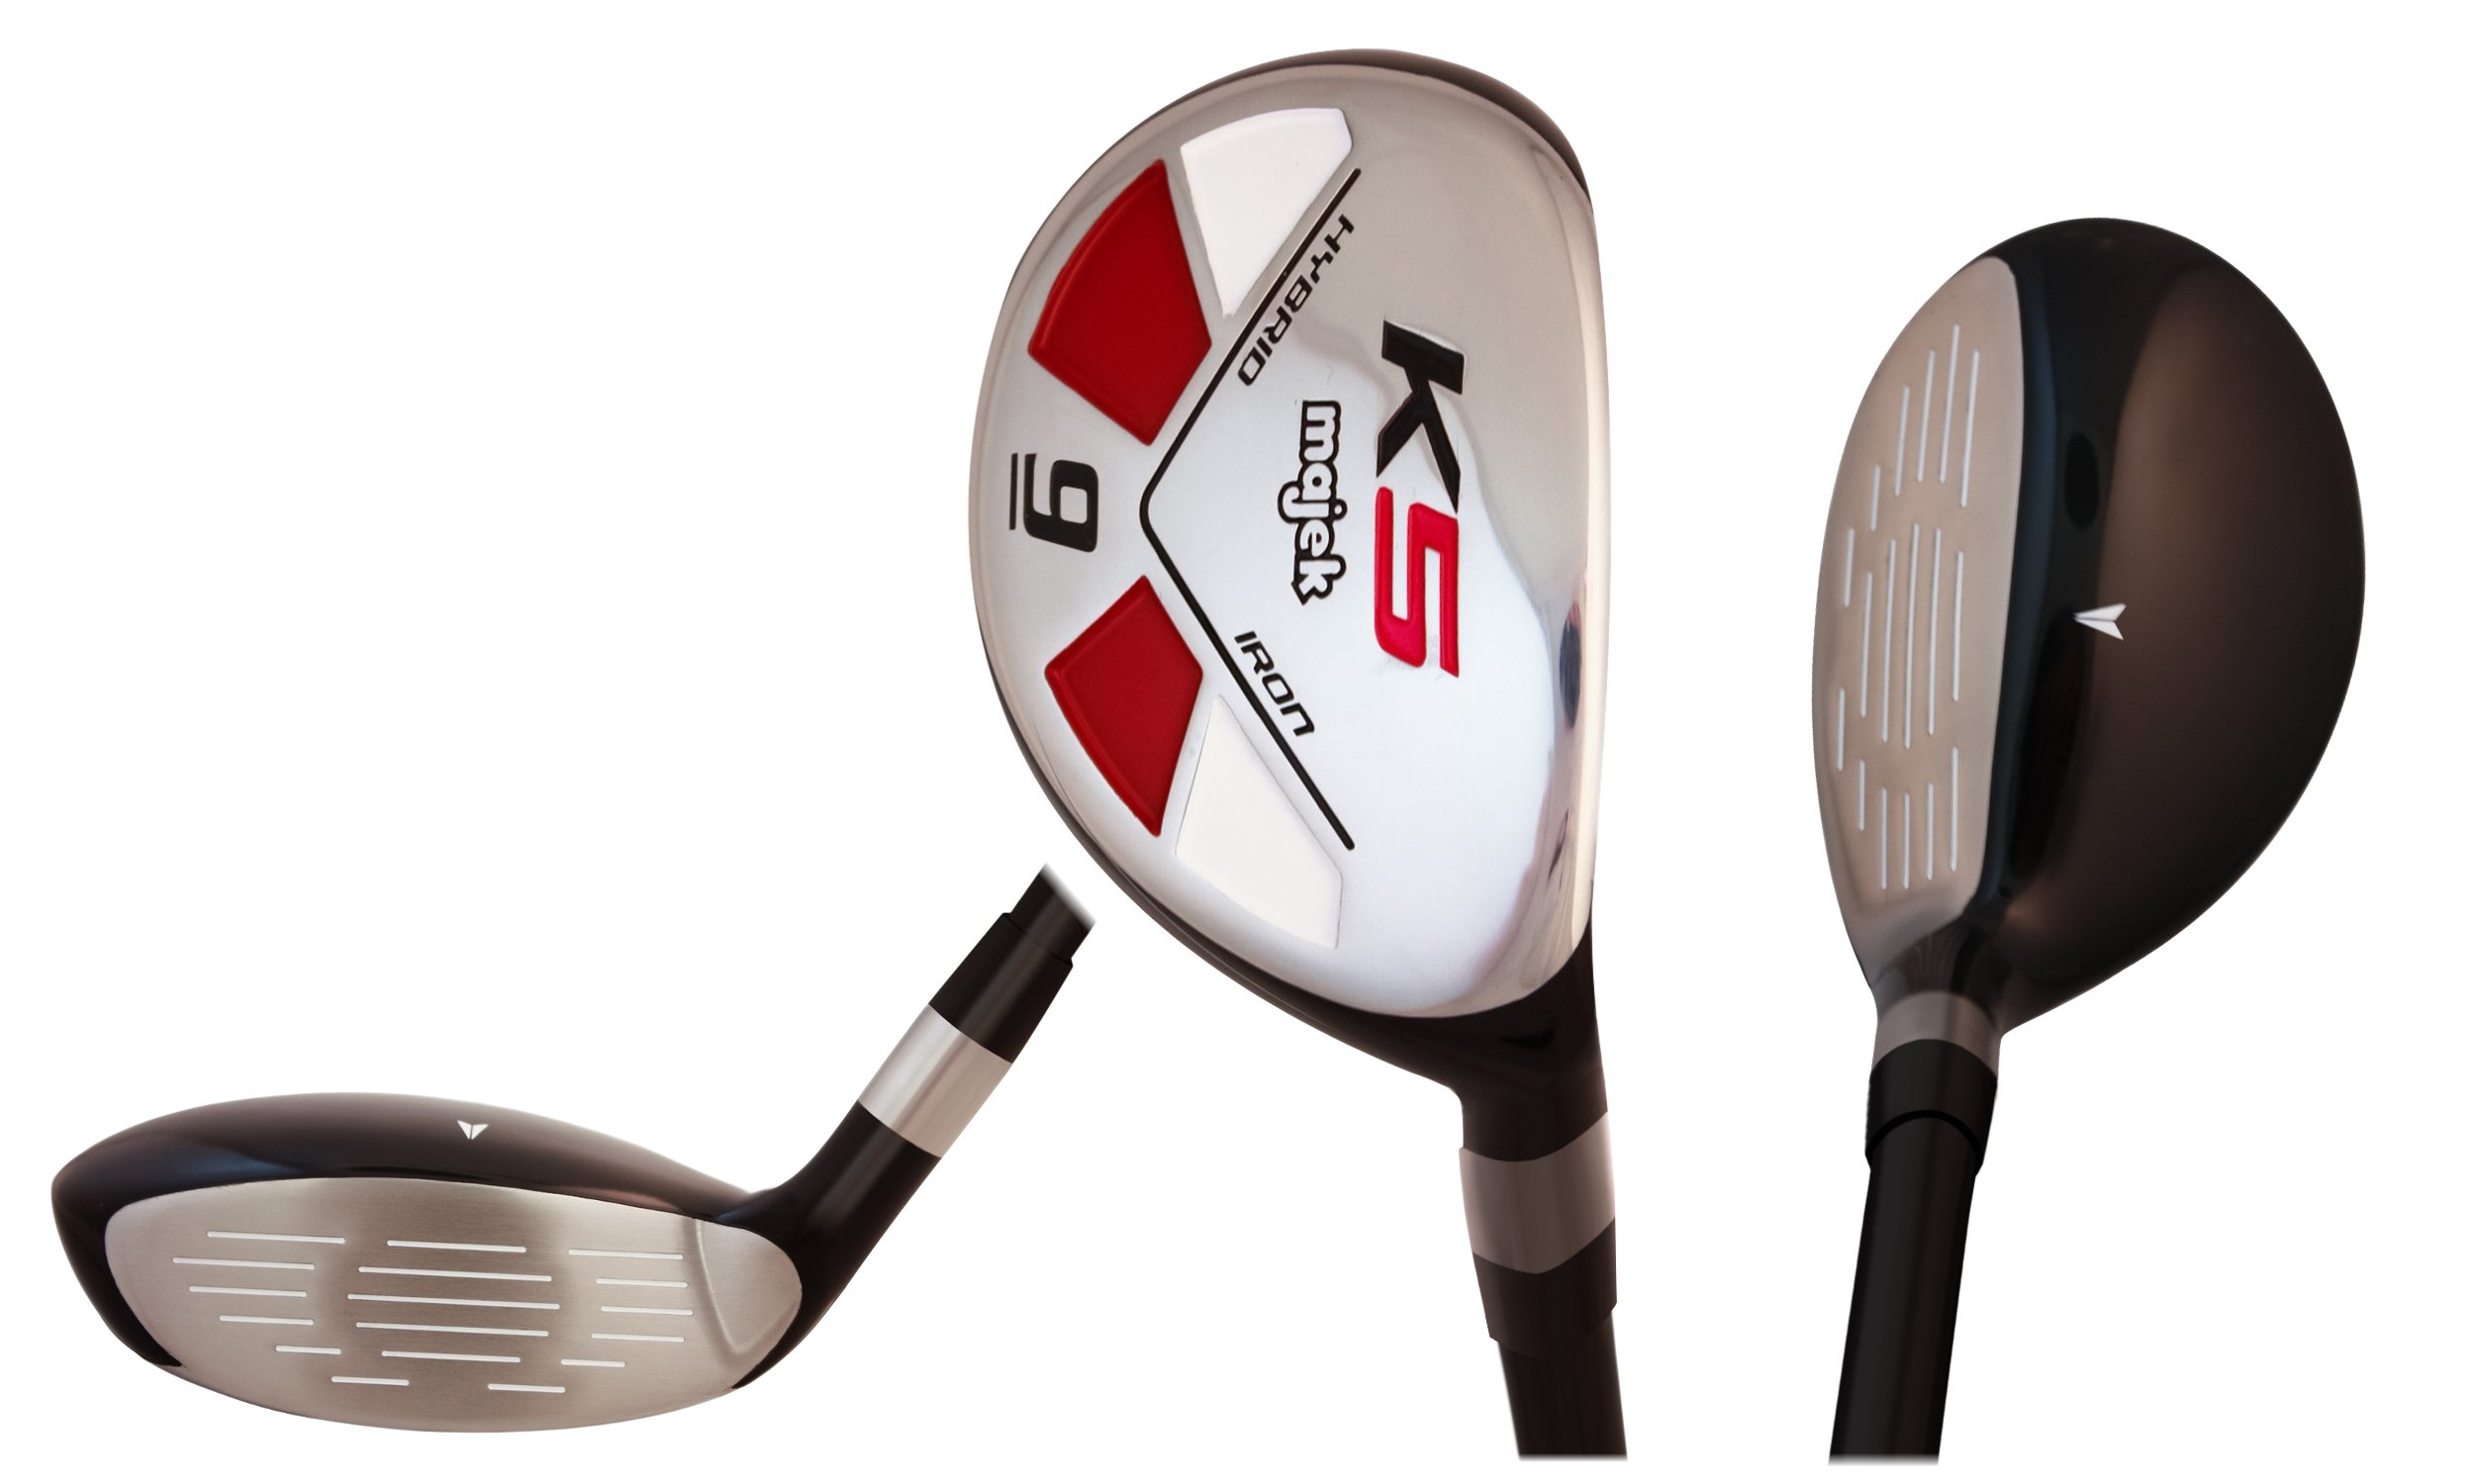 Majek Golf Senior Lady #9 Hybrid Lady Flex Right Handed New Utility L Flex Club by Majek Golf